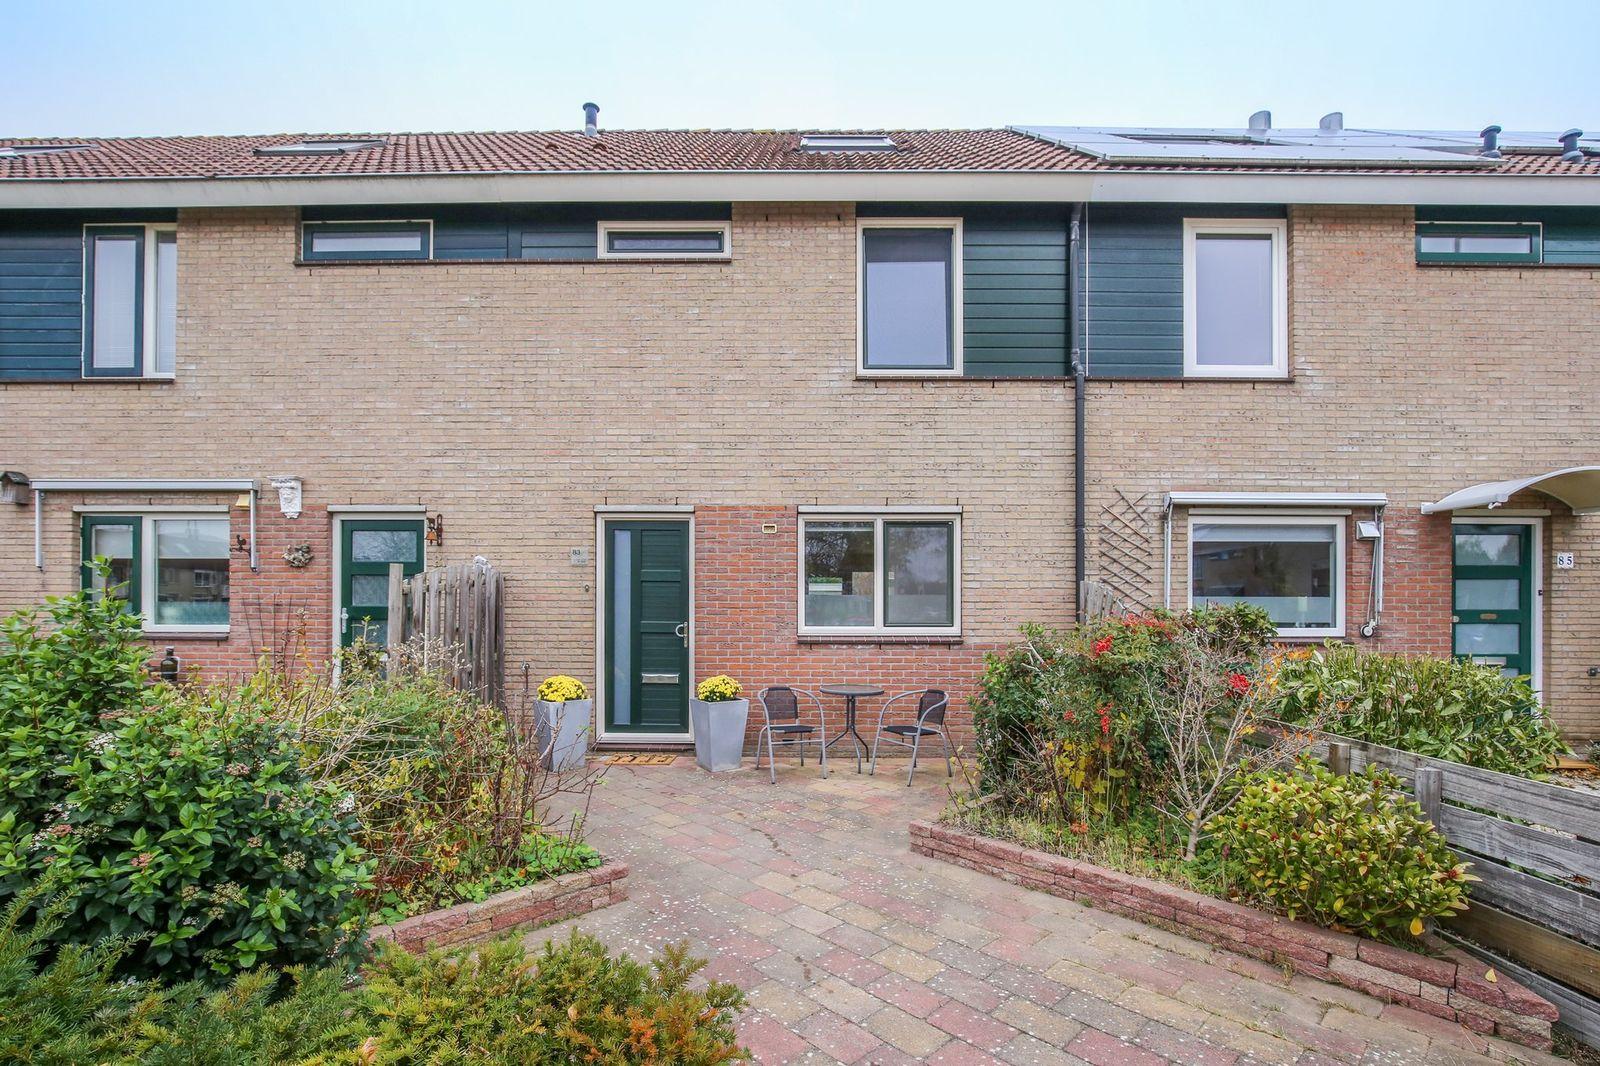 Poldermolenweg 83, Almere